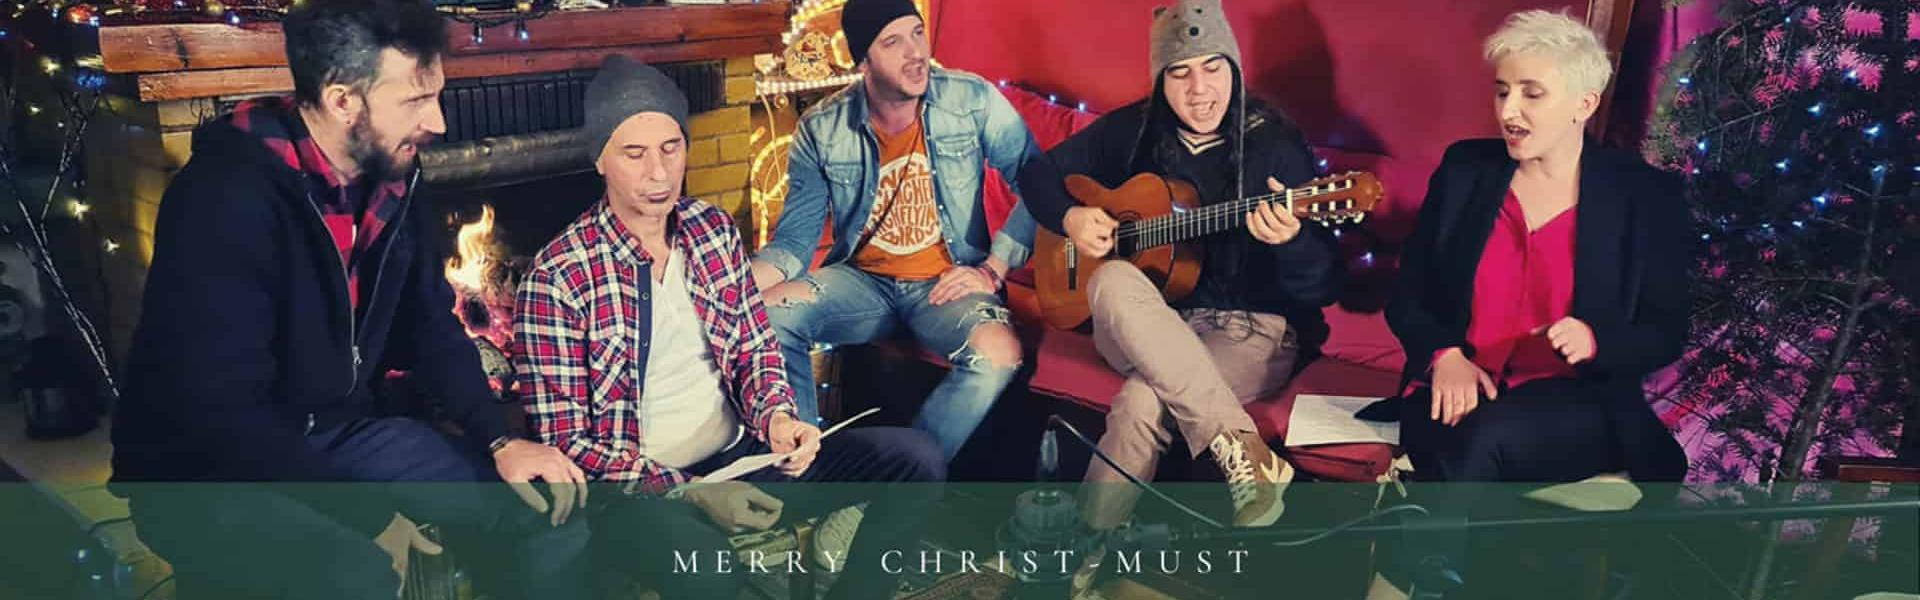 Christmas unplugged - Loutraki live